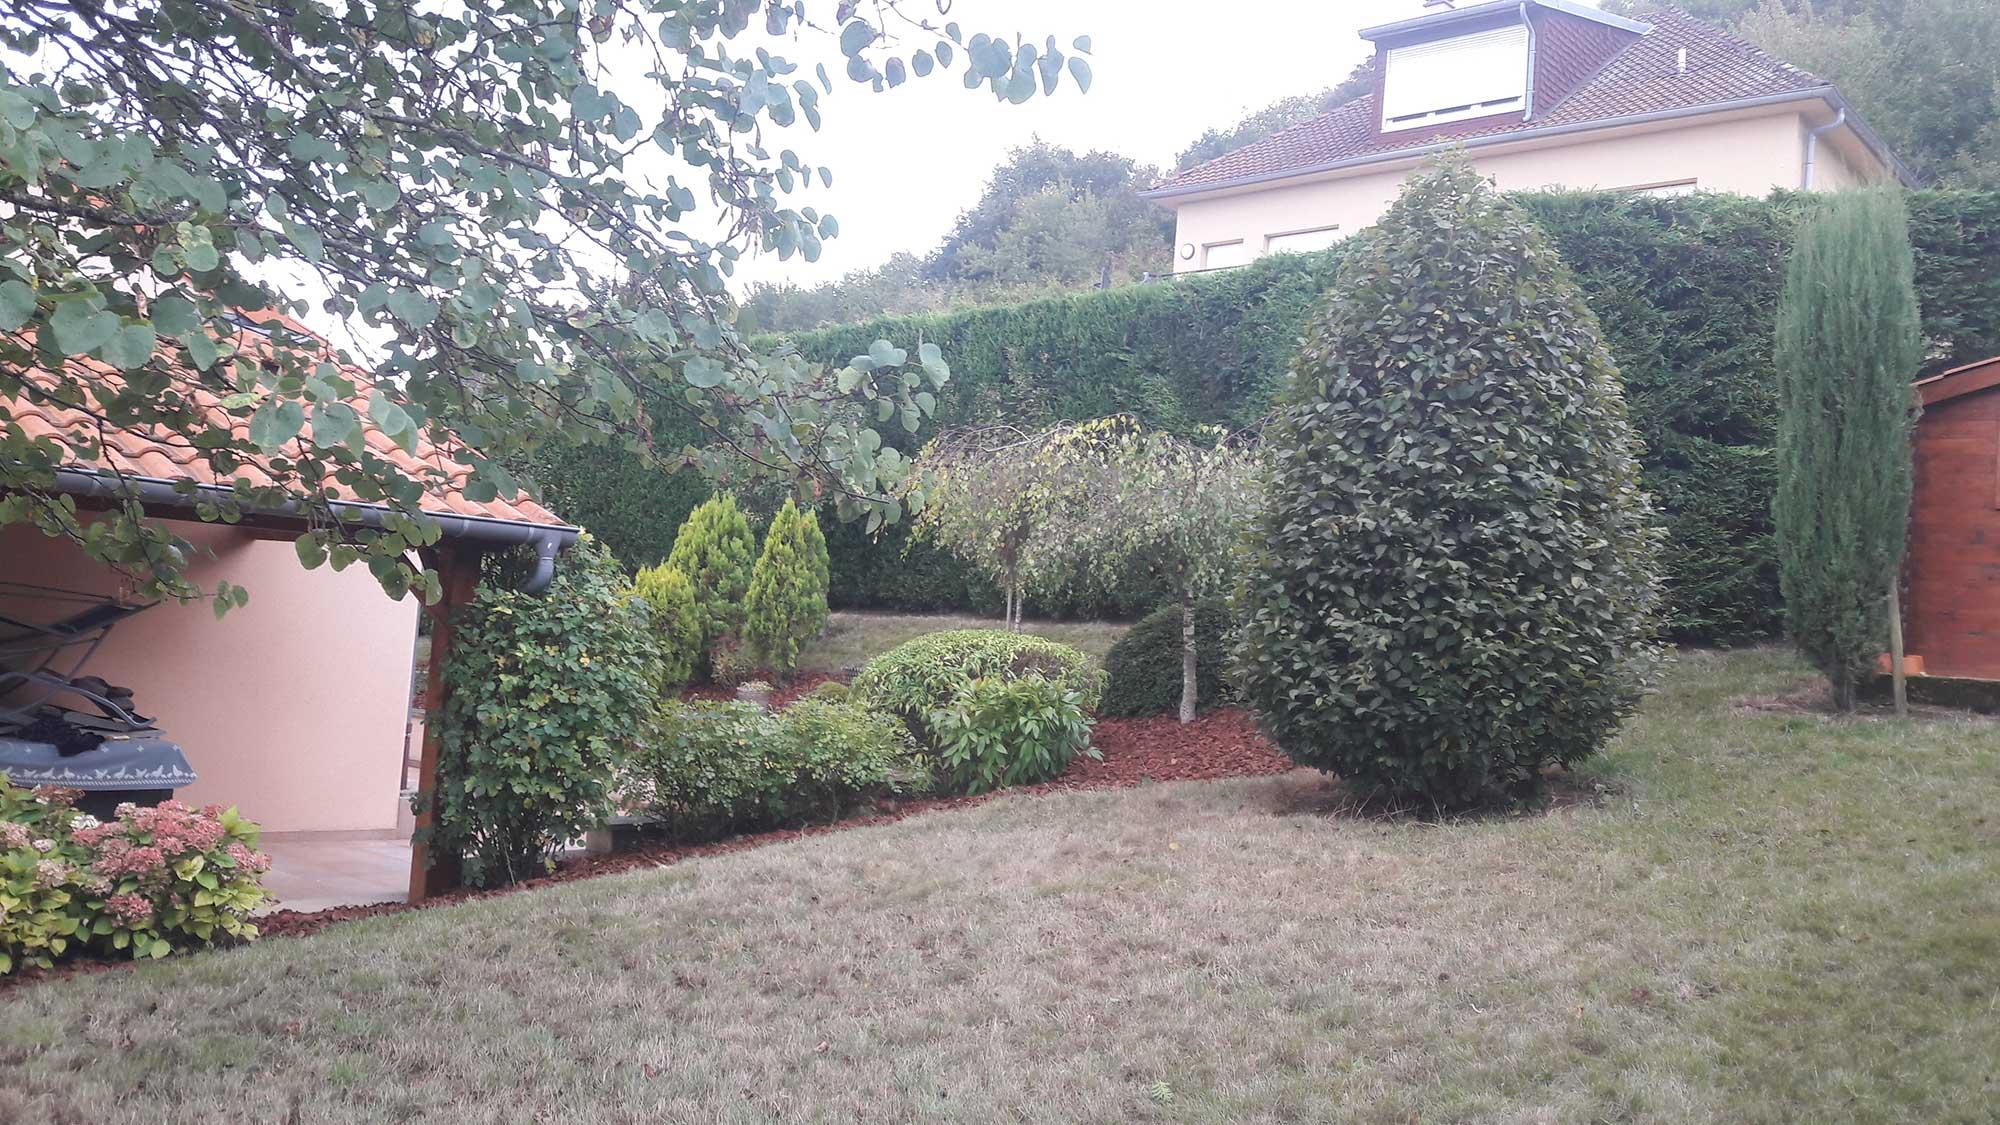 entretien de jardin s a r l des tailles d 39 arbres. Black Bedroom Furniture Sets. Home Design Ideas